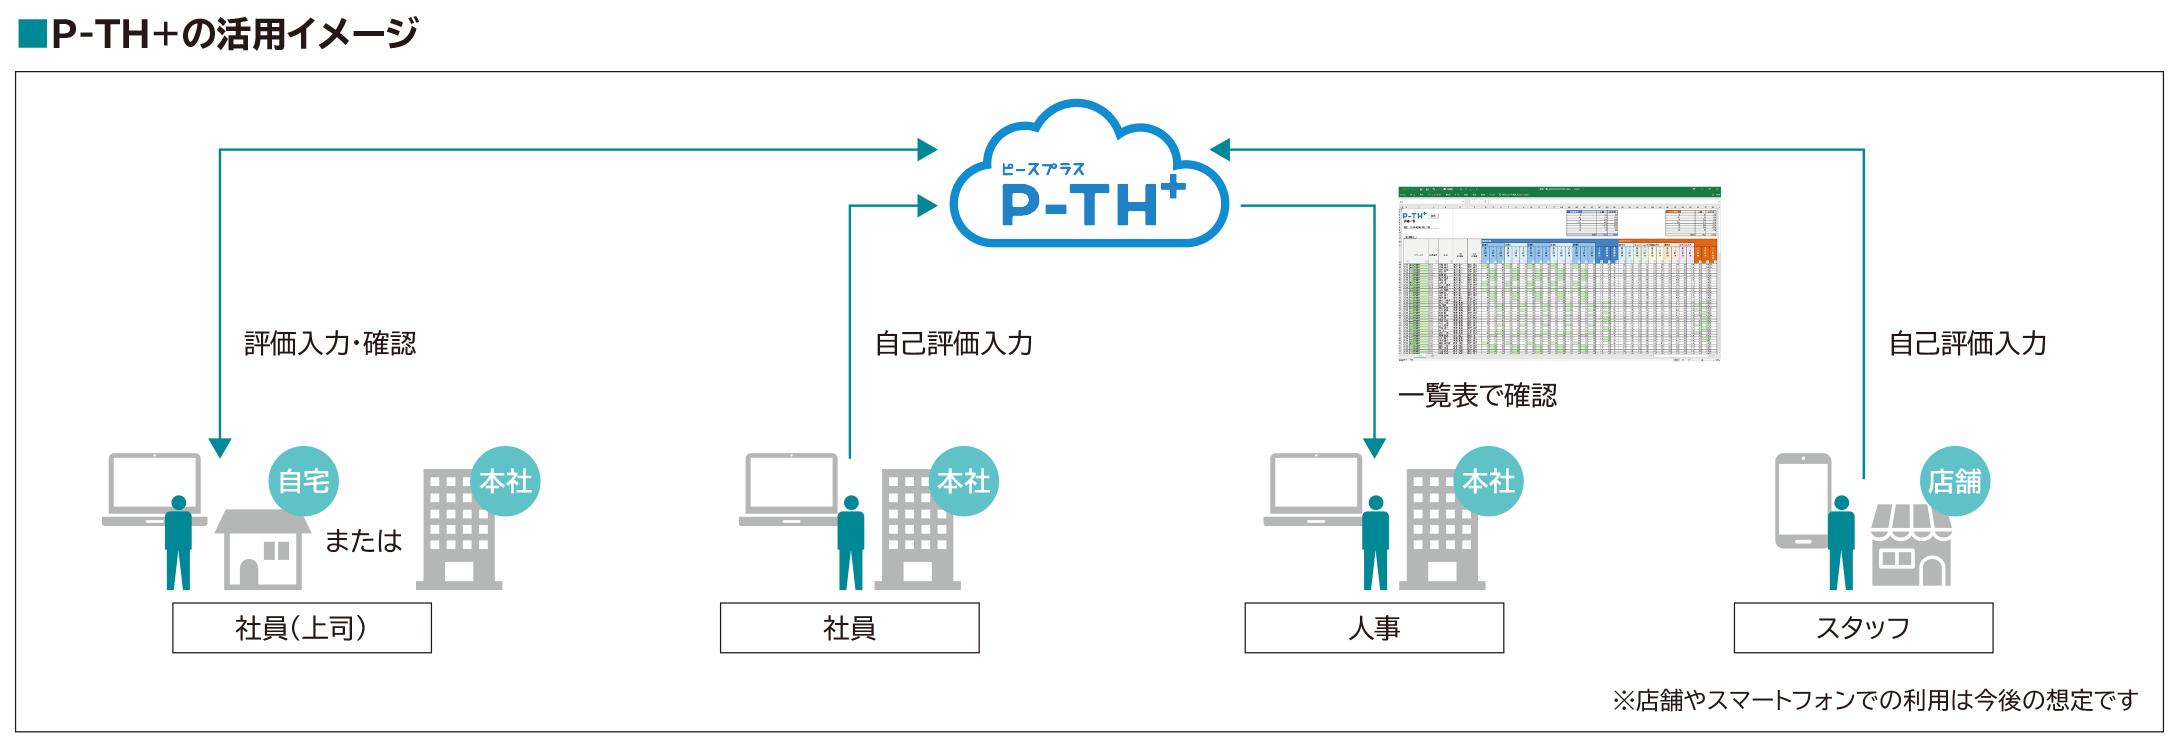 P-TH+の活用イメージ